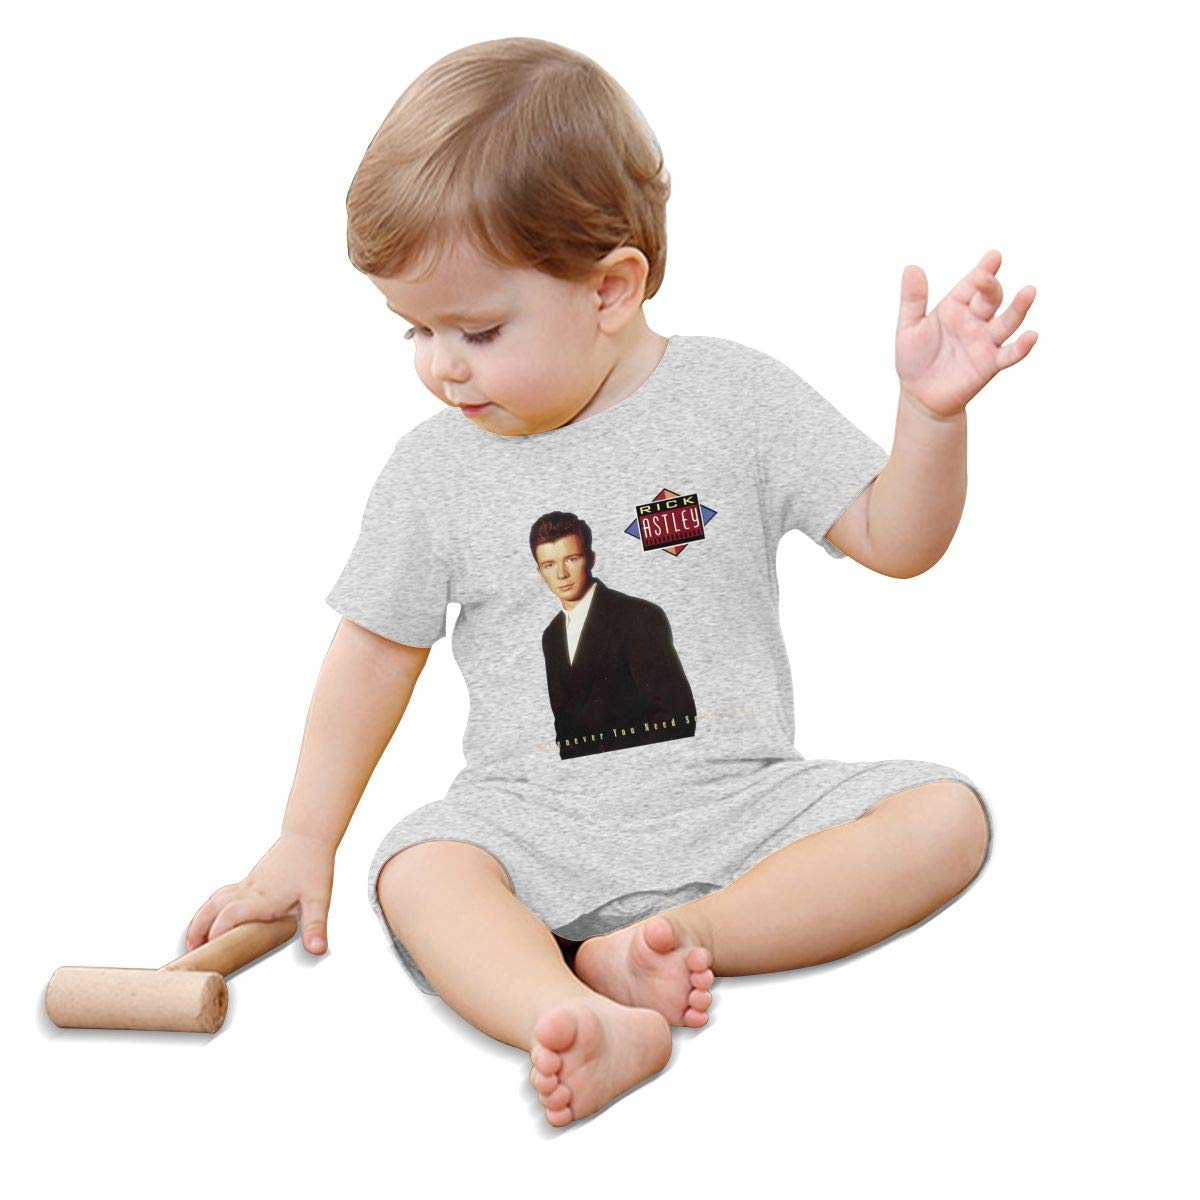 Honghuawenhua Baby Adorable Infant Soft Short Sleeves Bodysuit Double Print